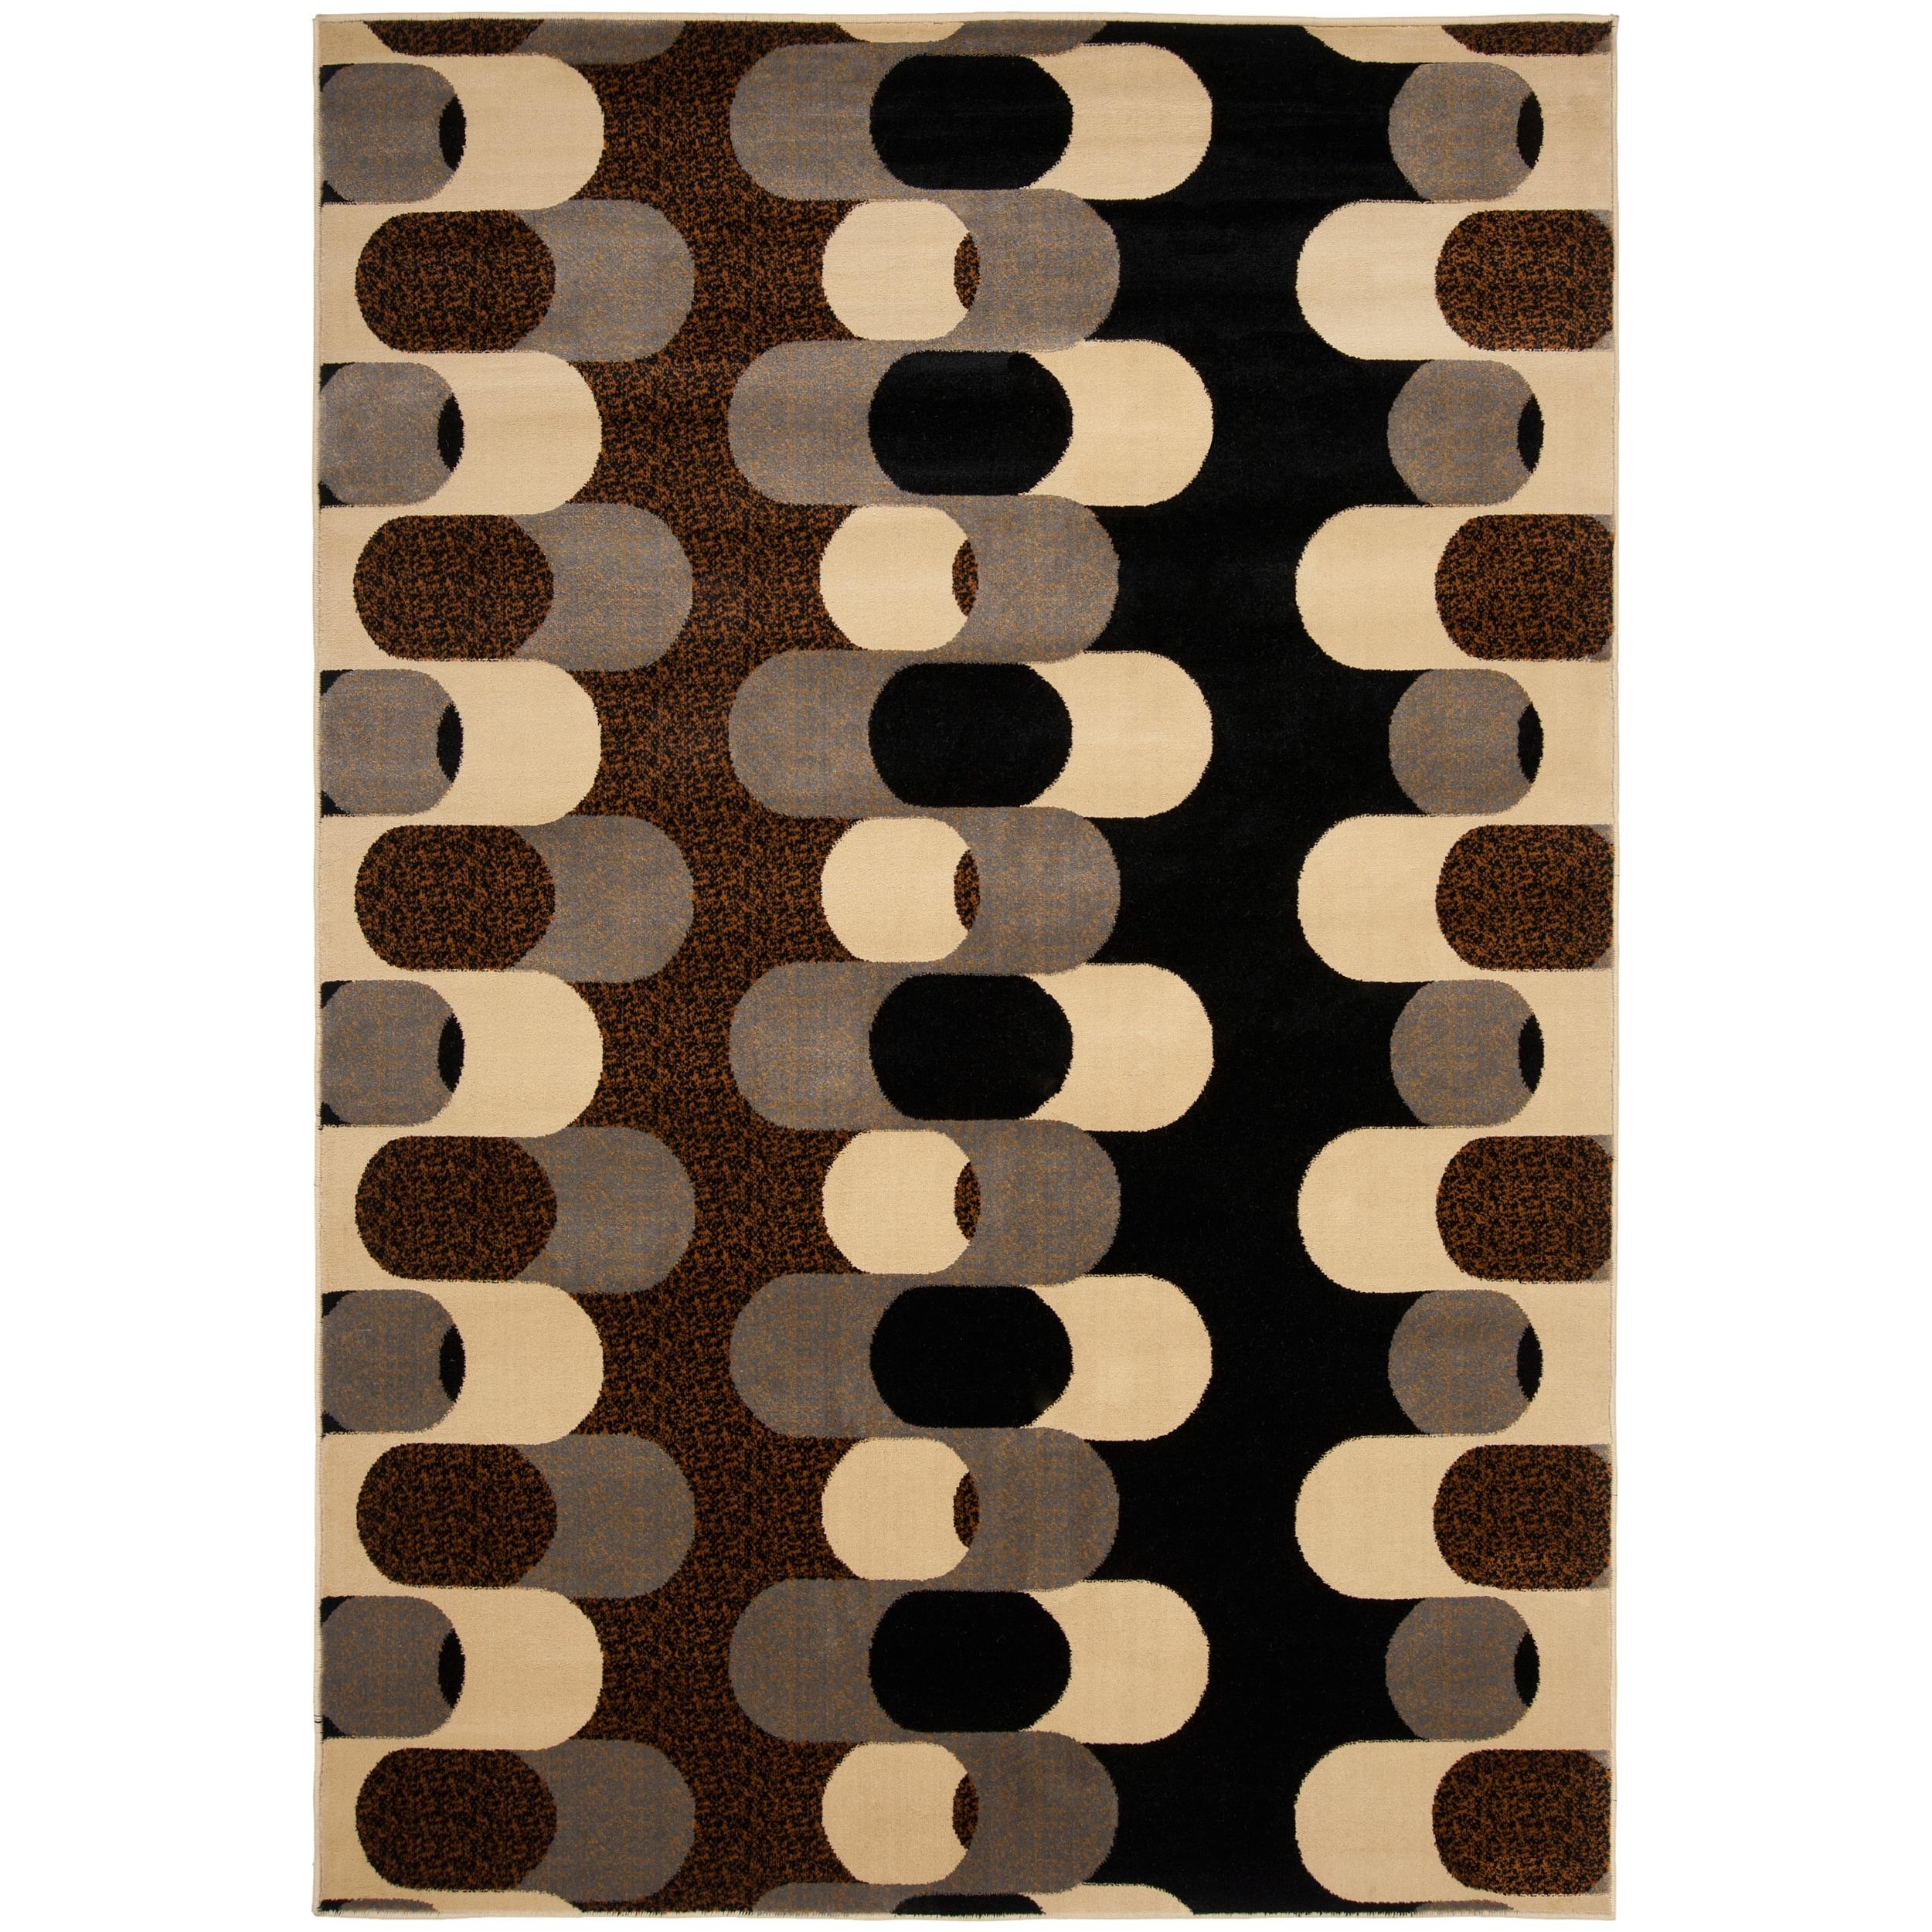 Meticulously Woven Black Mockernut Geometric Rug (7'10 x 10'3)